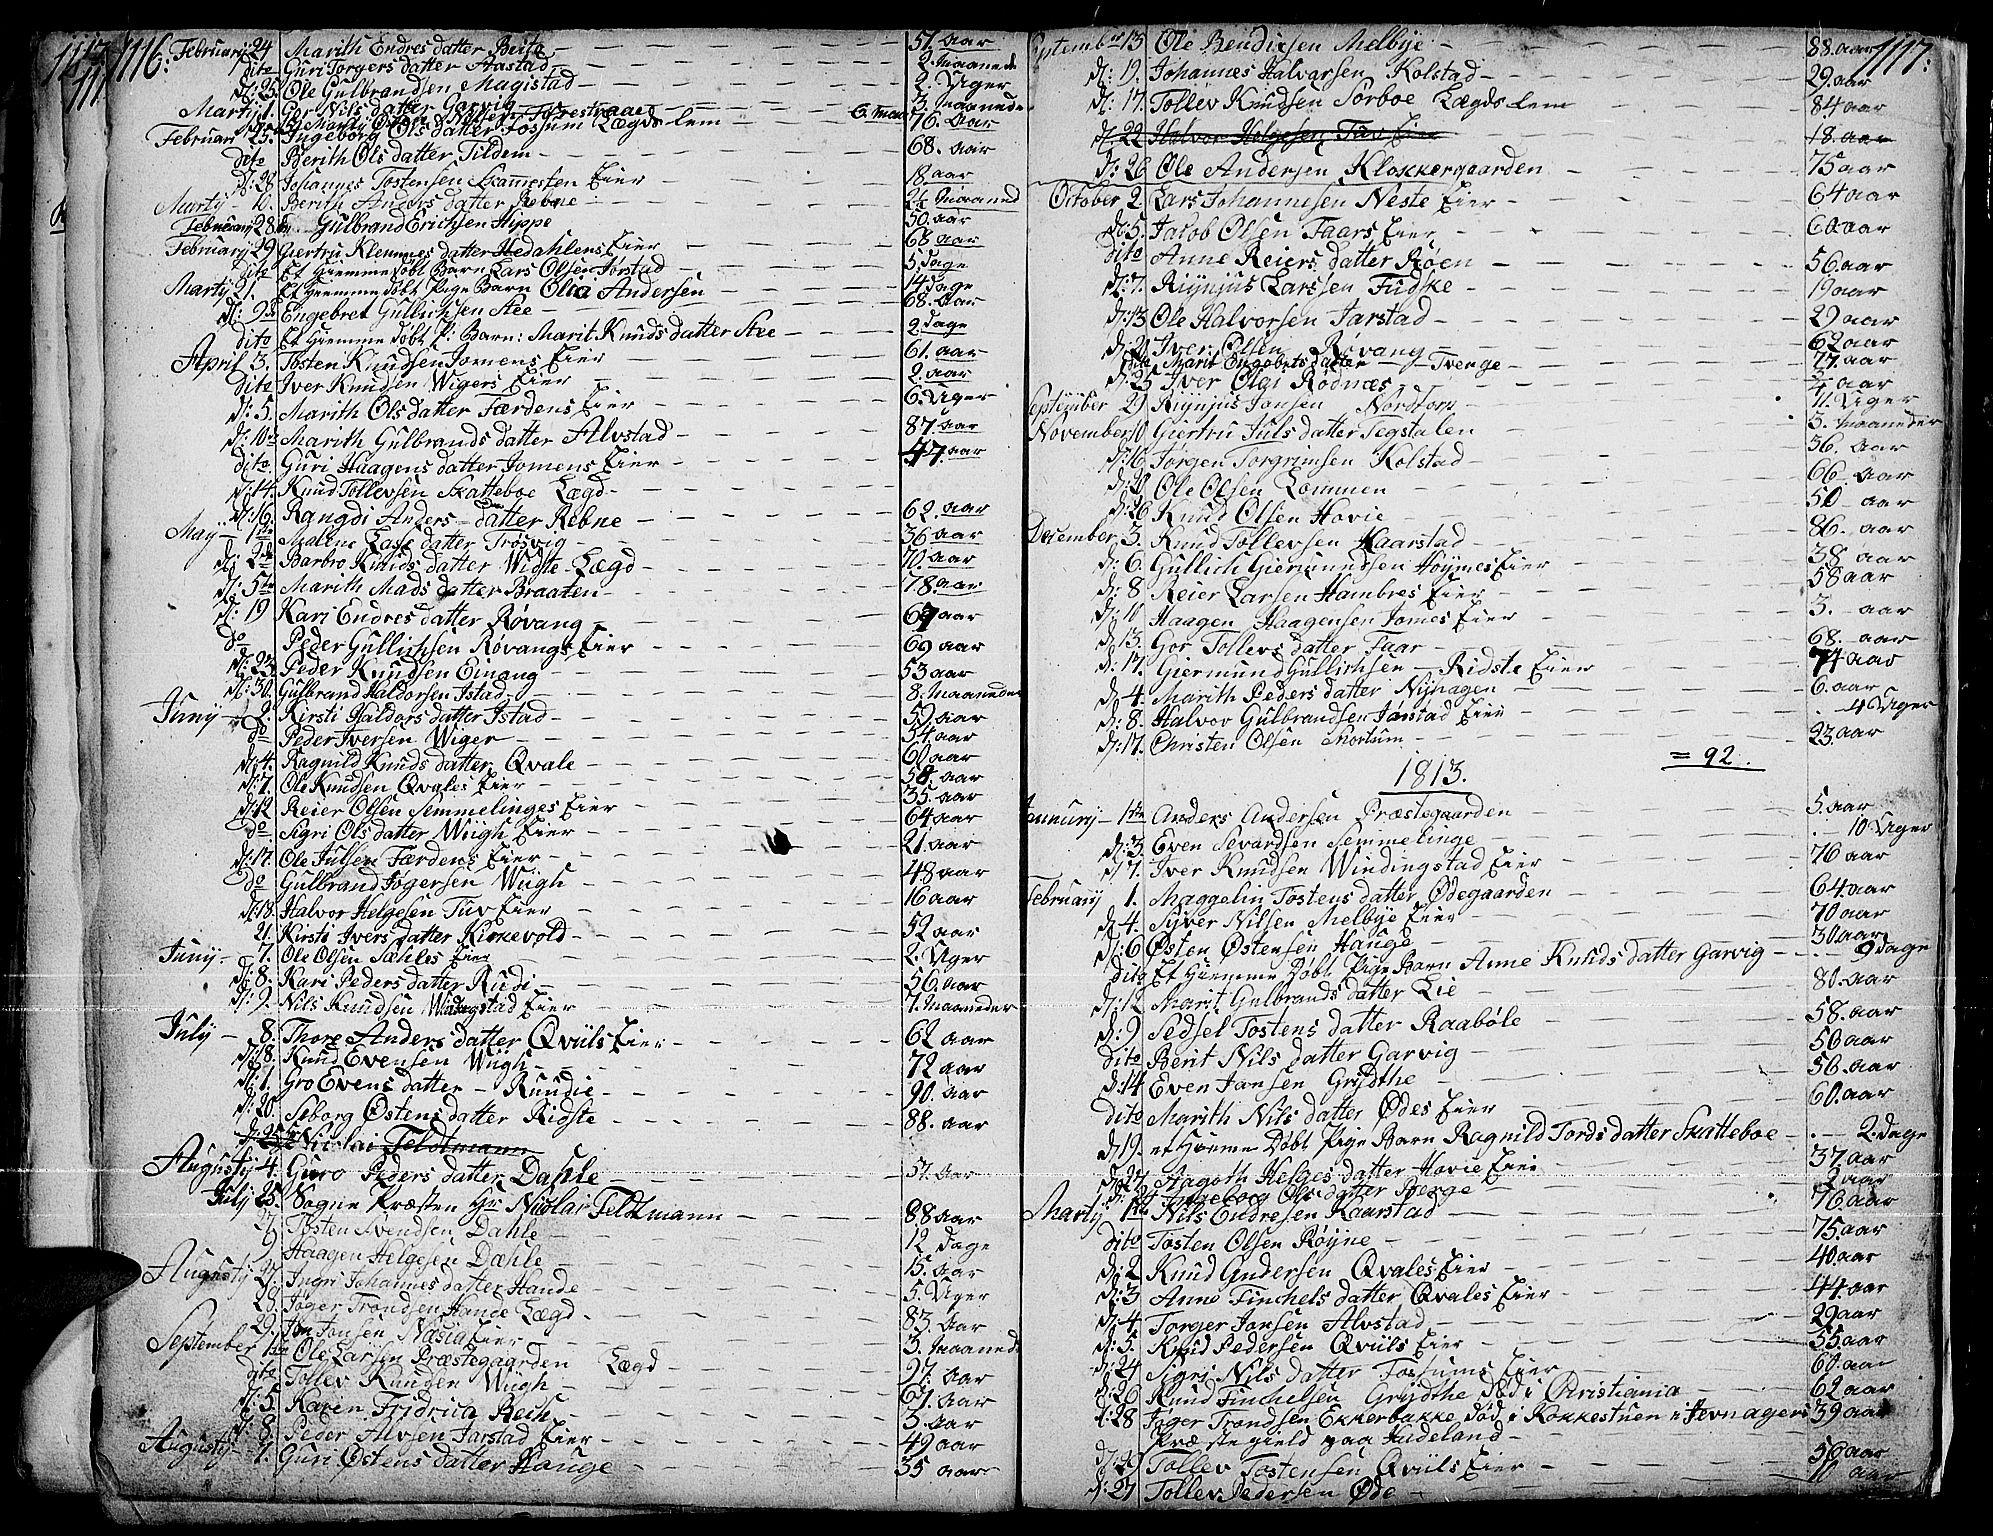 SAH, Slidre prestekontor, Parish register (official) no. 1, 1724-1814, p. 1116-1117